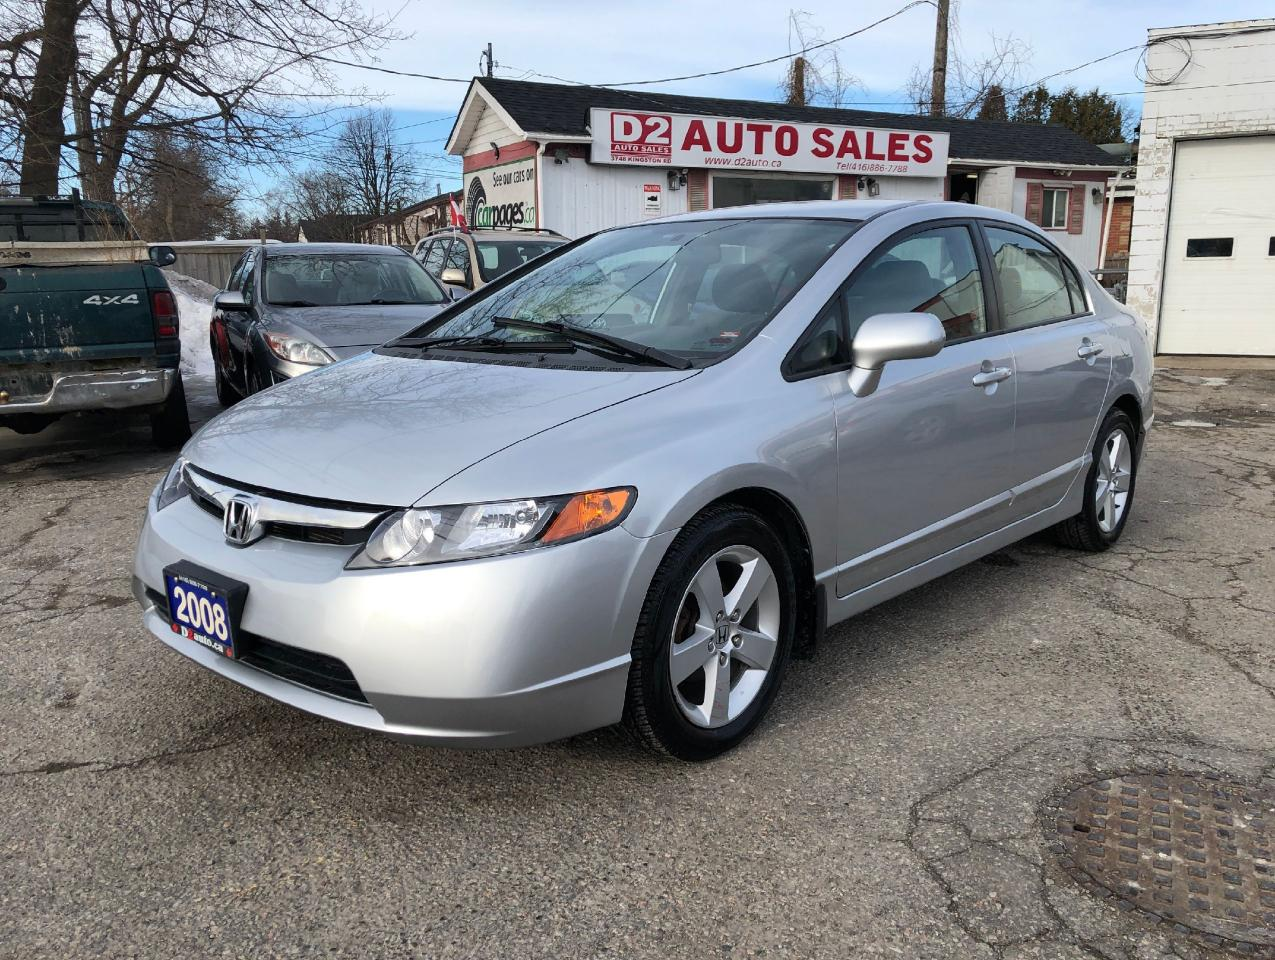 2008 Honda Civic LX/Certified/5 Speed Manual/Gas Saver